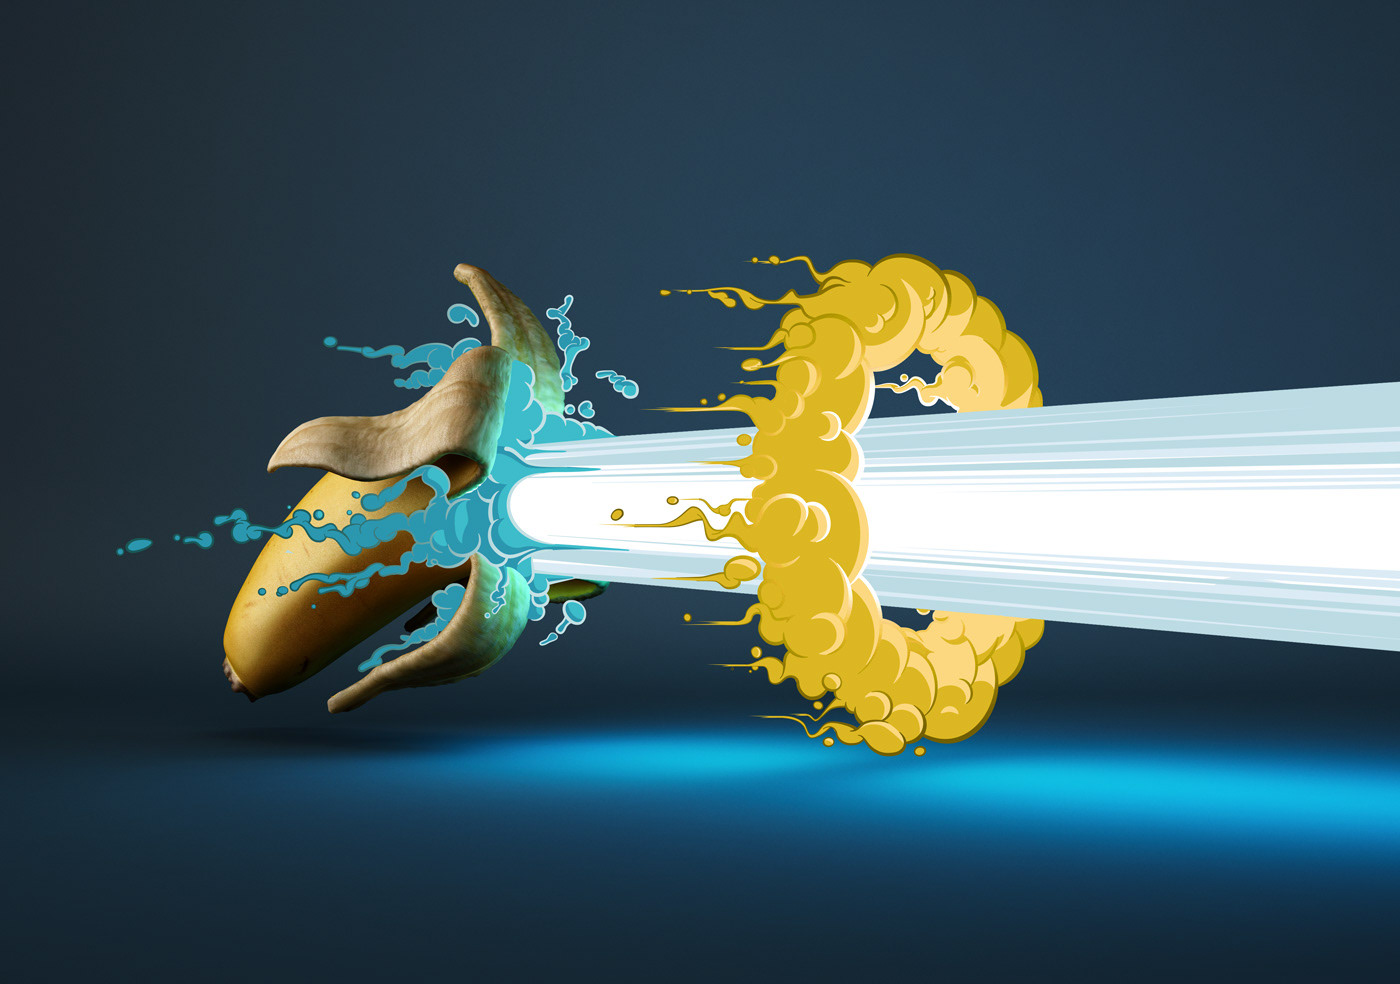 banana Pineapple Coconut explosion CGI 3D cartoon Foods fruits boom vector digital painting toon